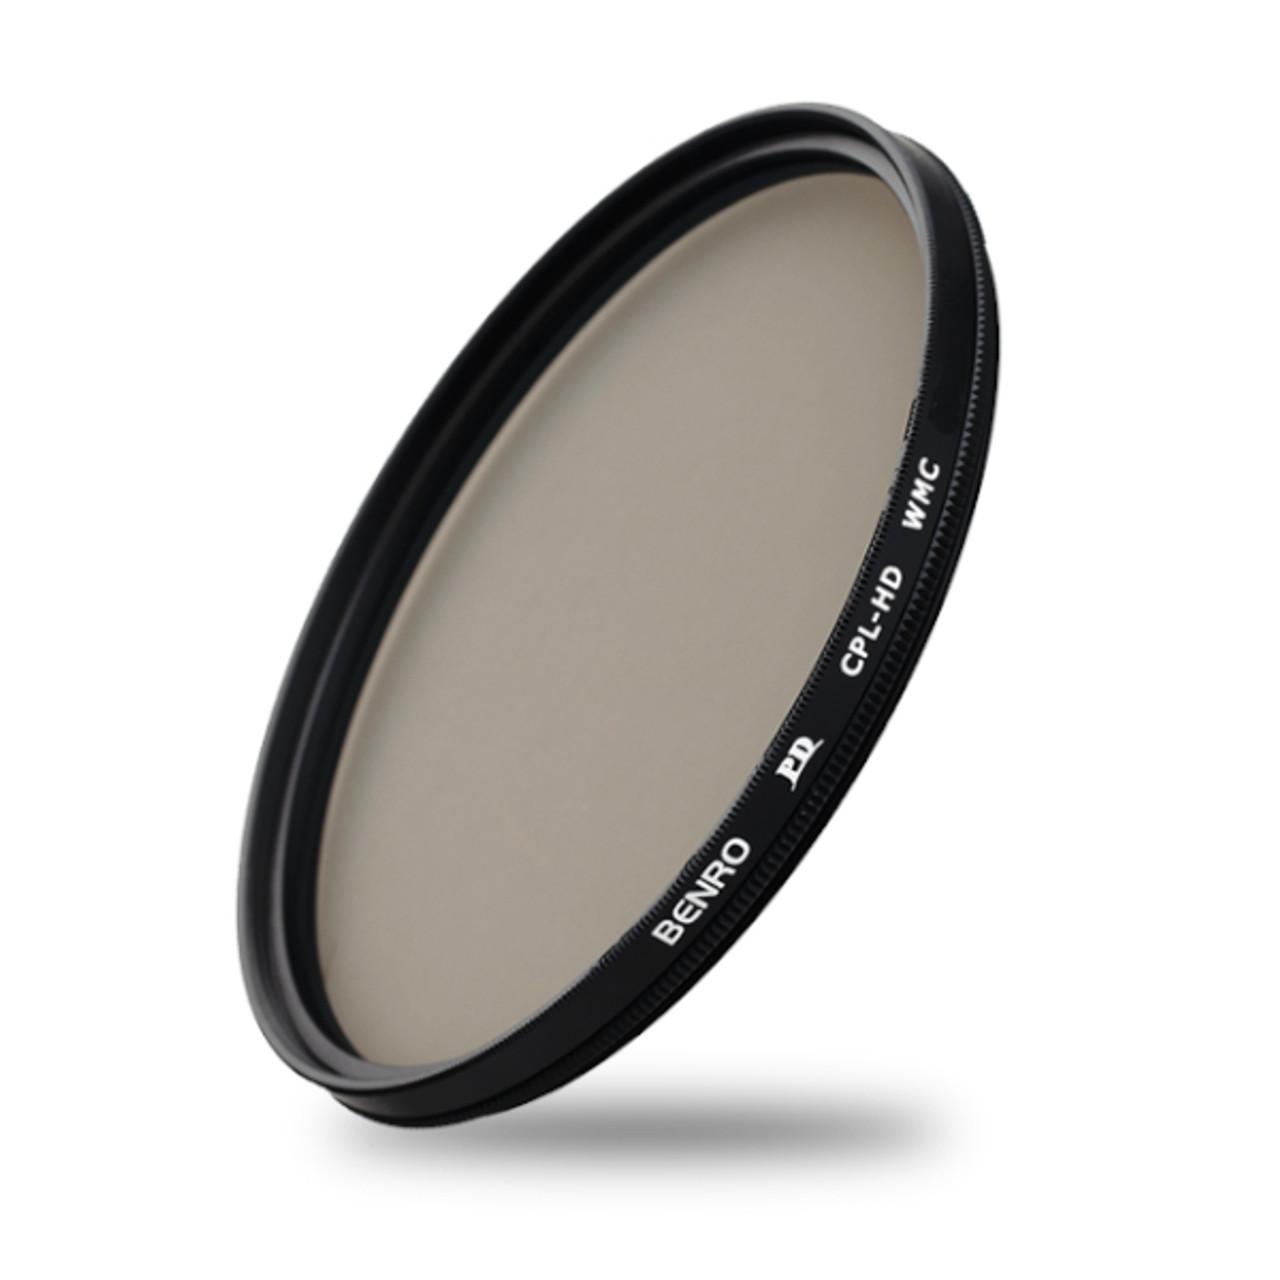 Benro PD Filter Circular Polariser 77mm